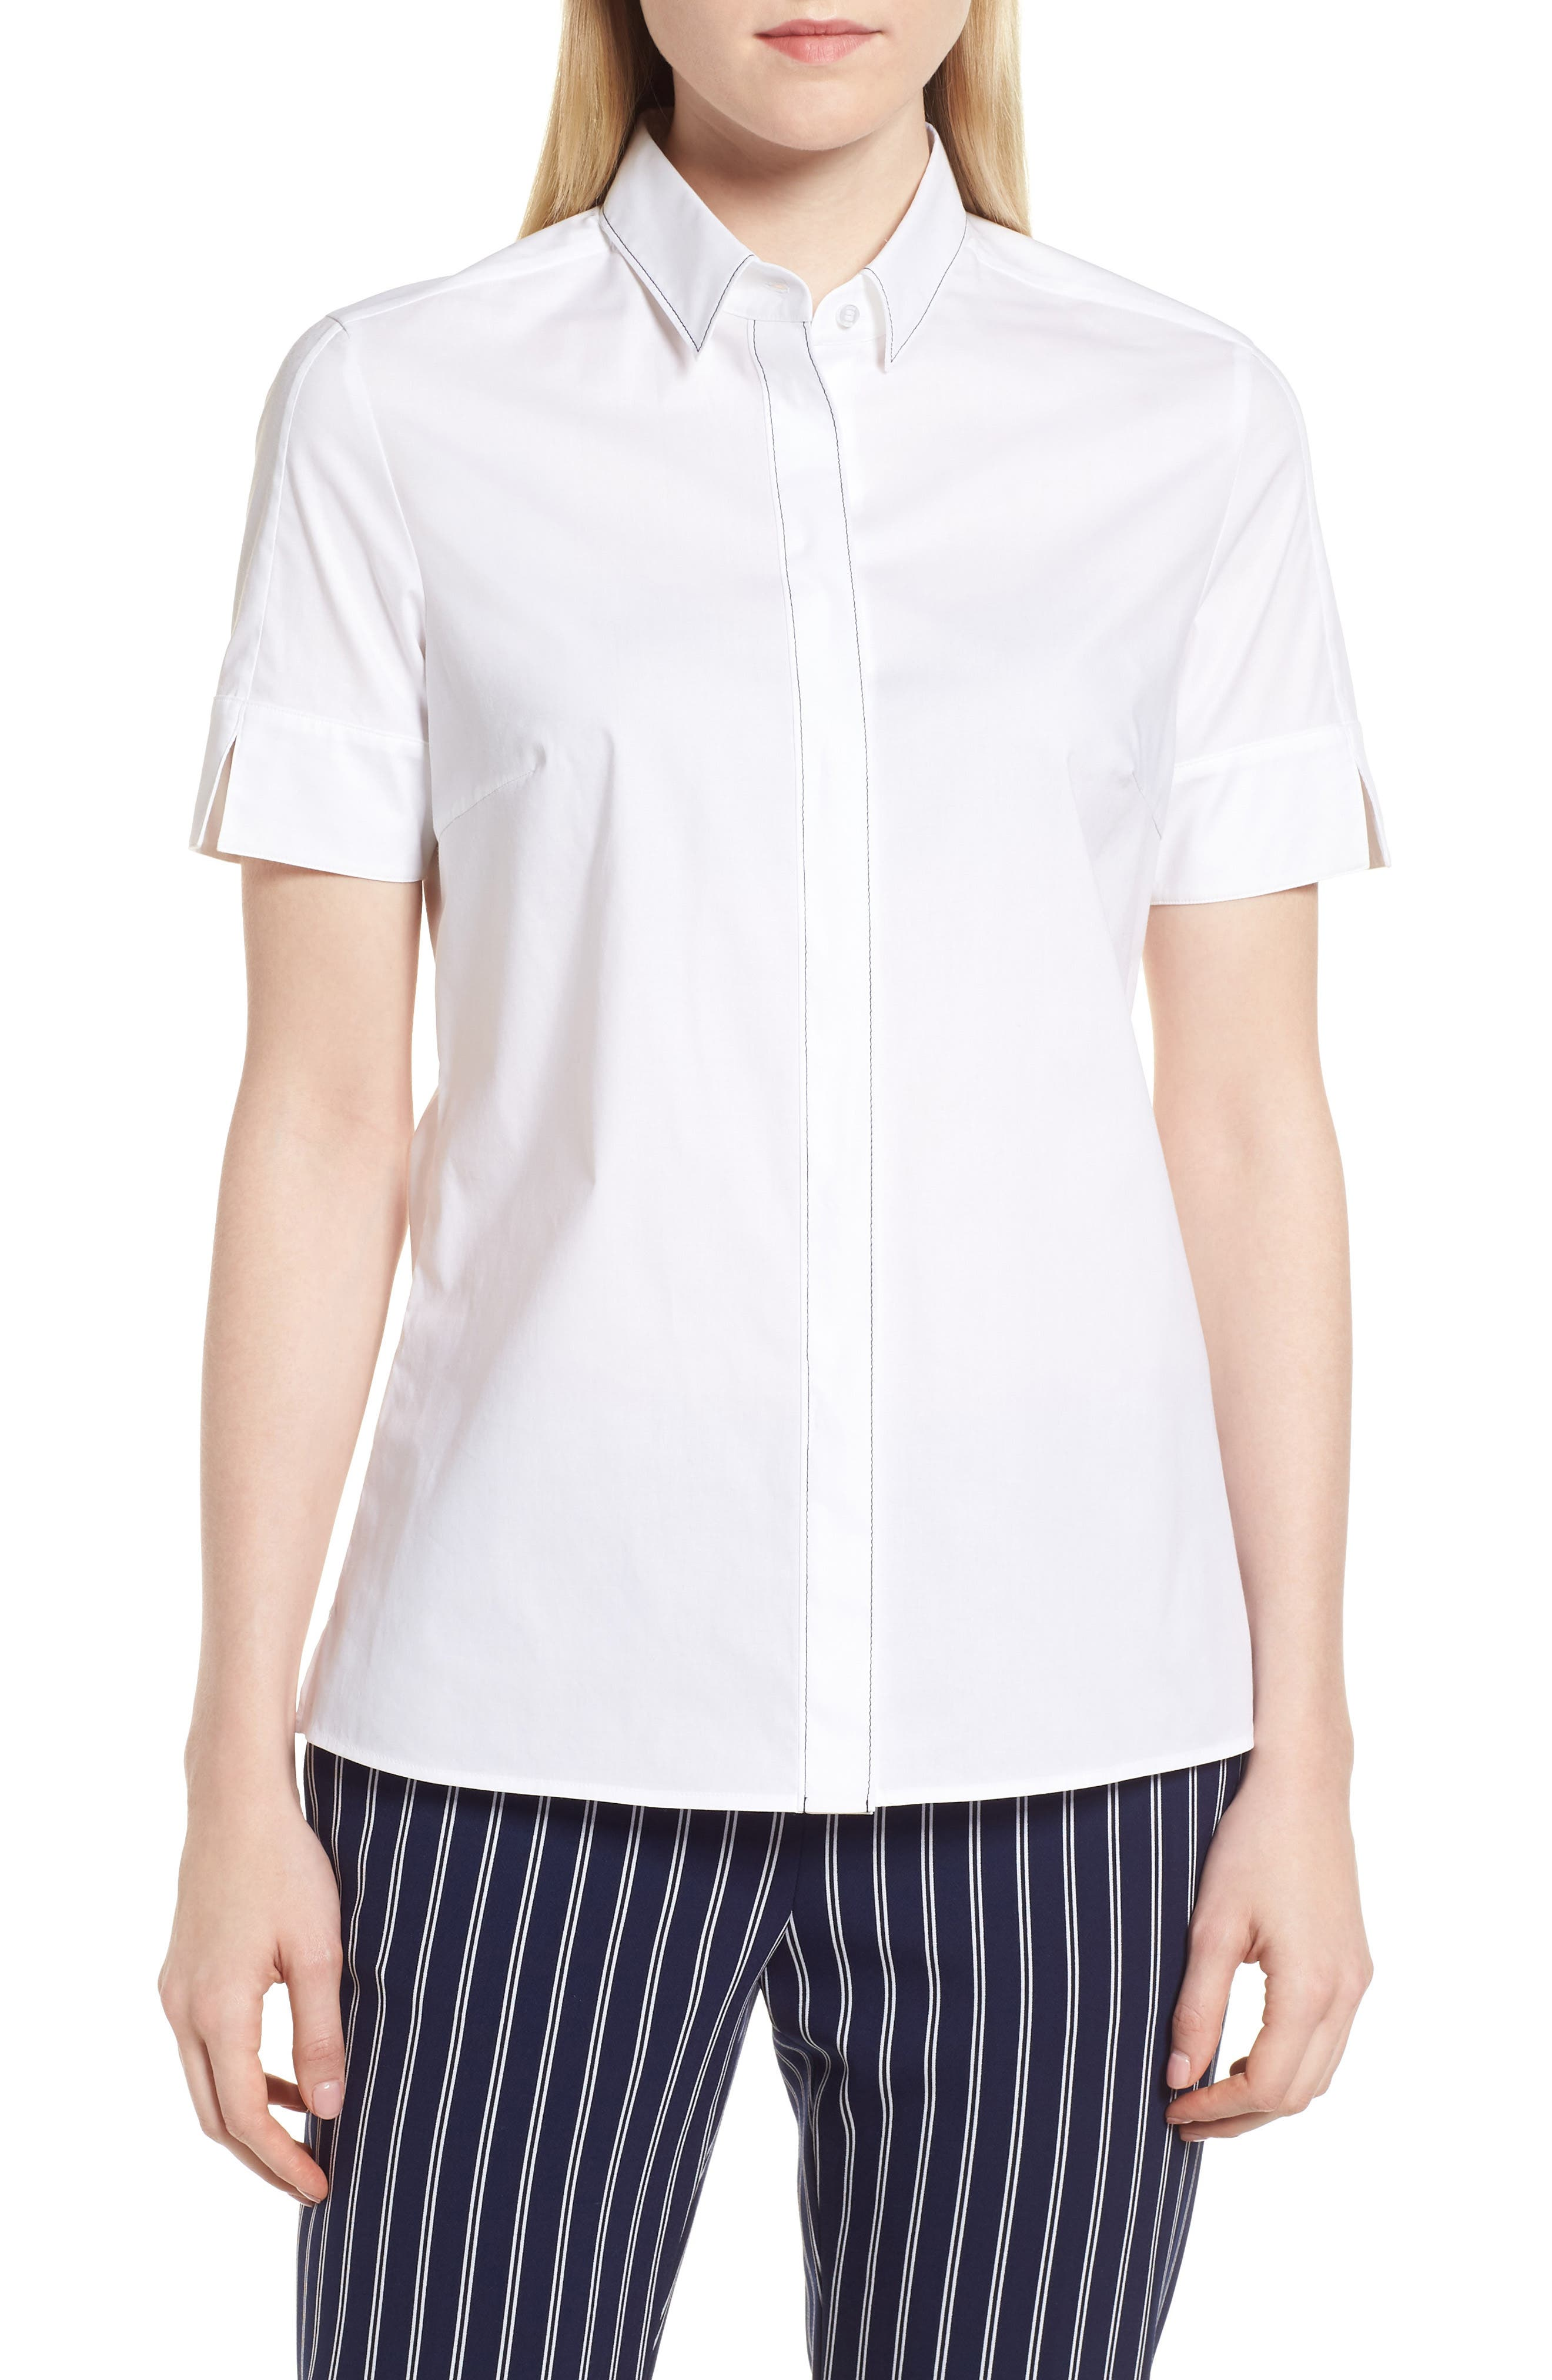 Balasera Stretch Cotton Blouse,                         Main,                         color, White